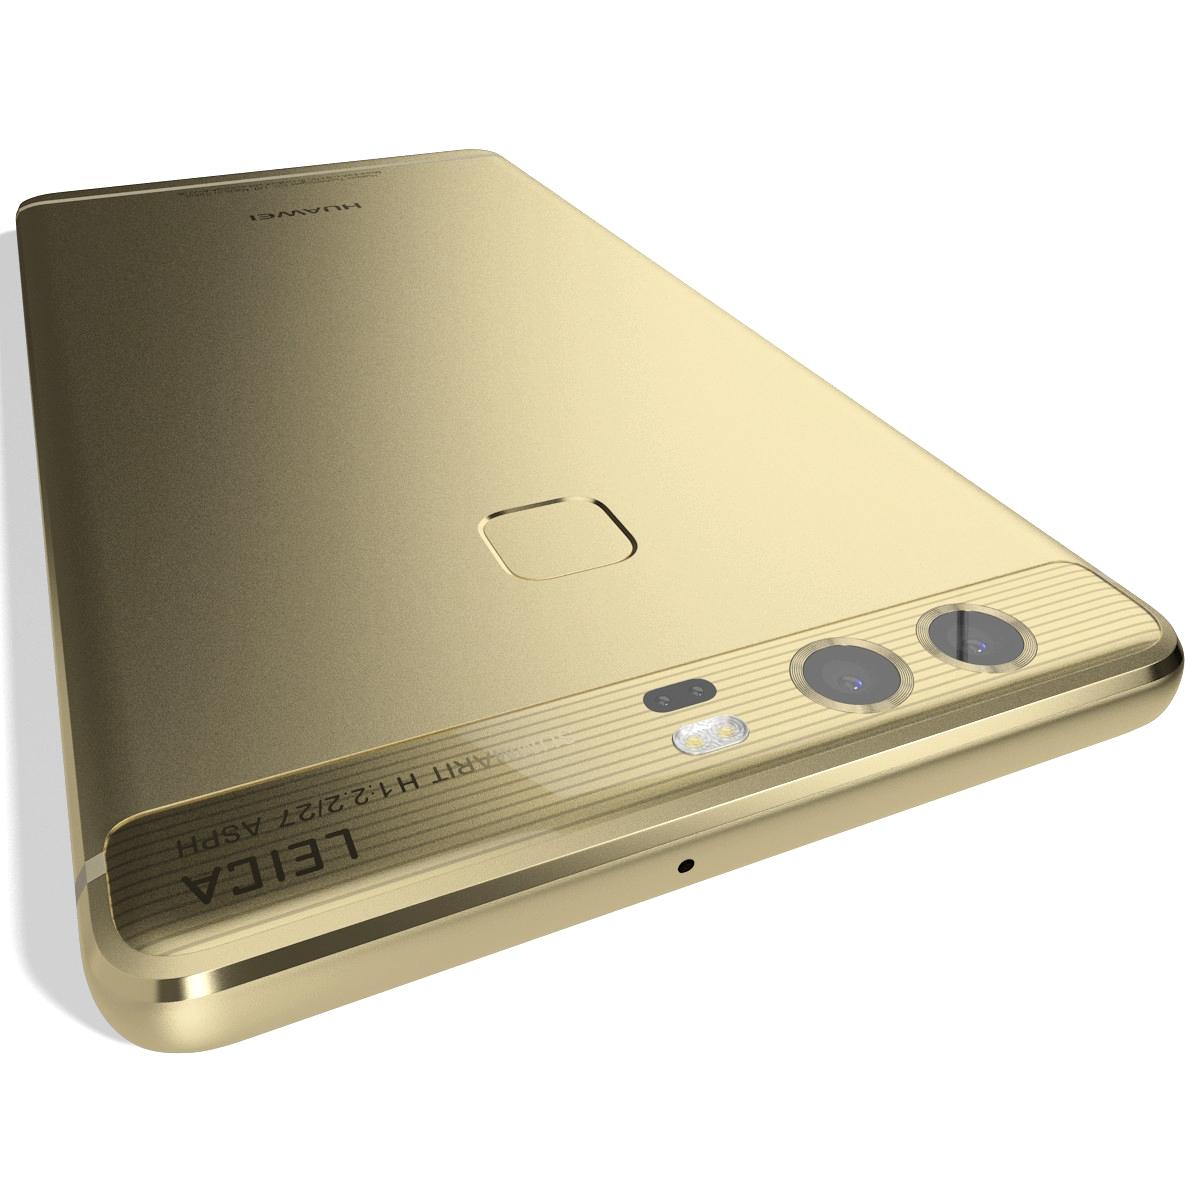 closes huawei p9 32gb dual sim eva l19 prestige gold from